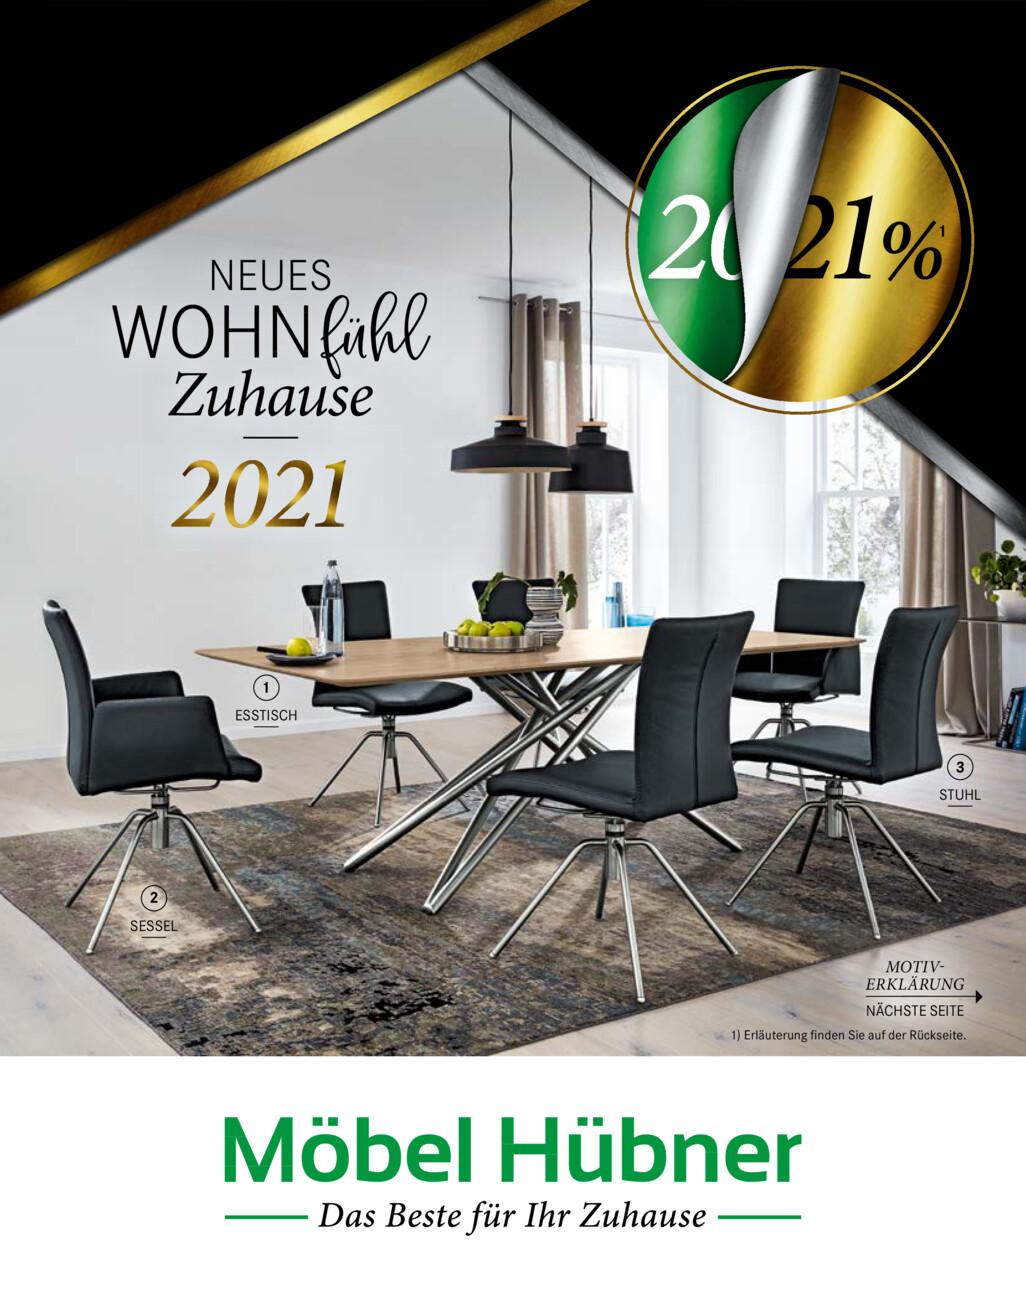 Möbel Hübner vom Donnerstag, 17.06.2021